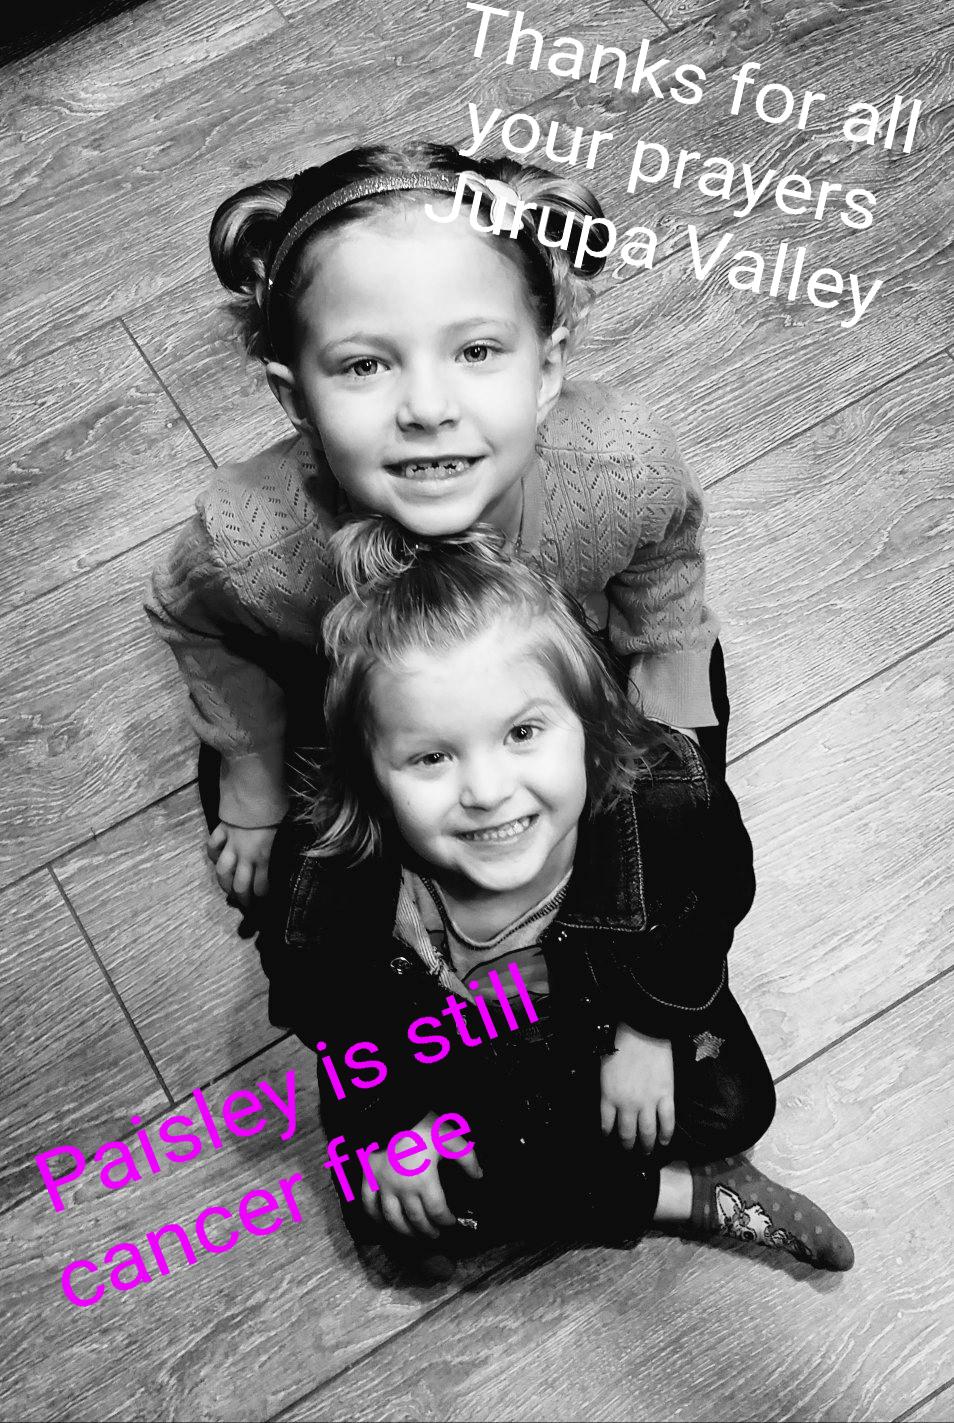 Paisley cancer free.jpg